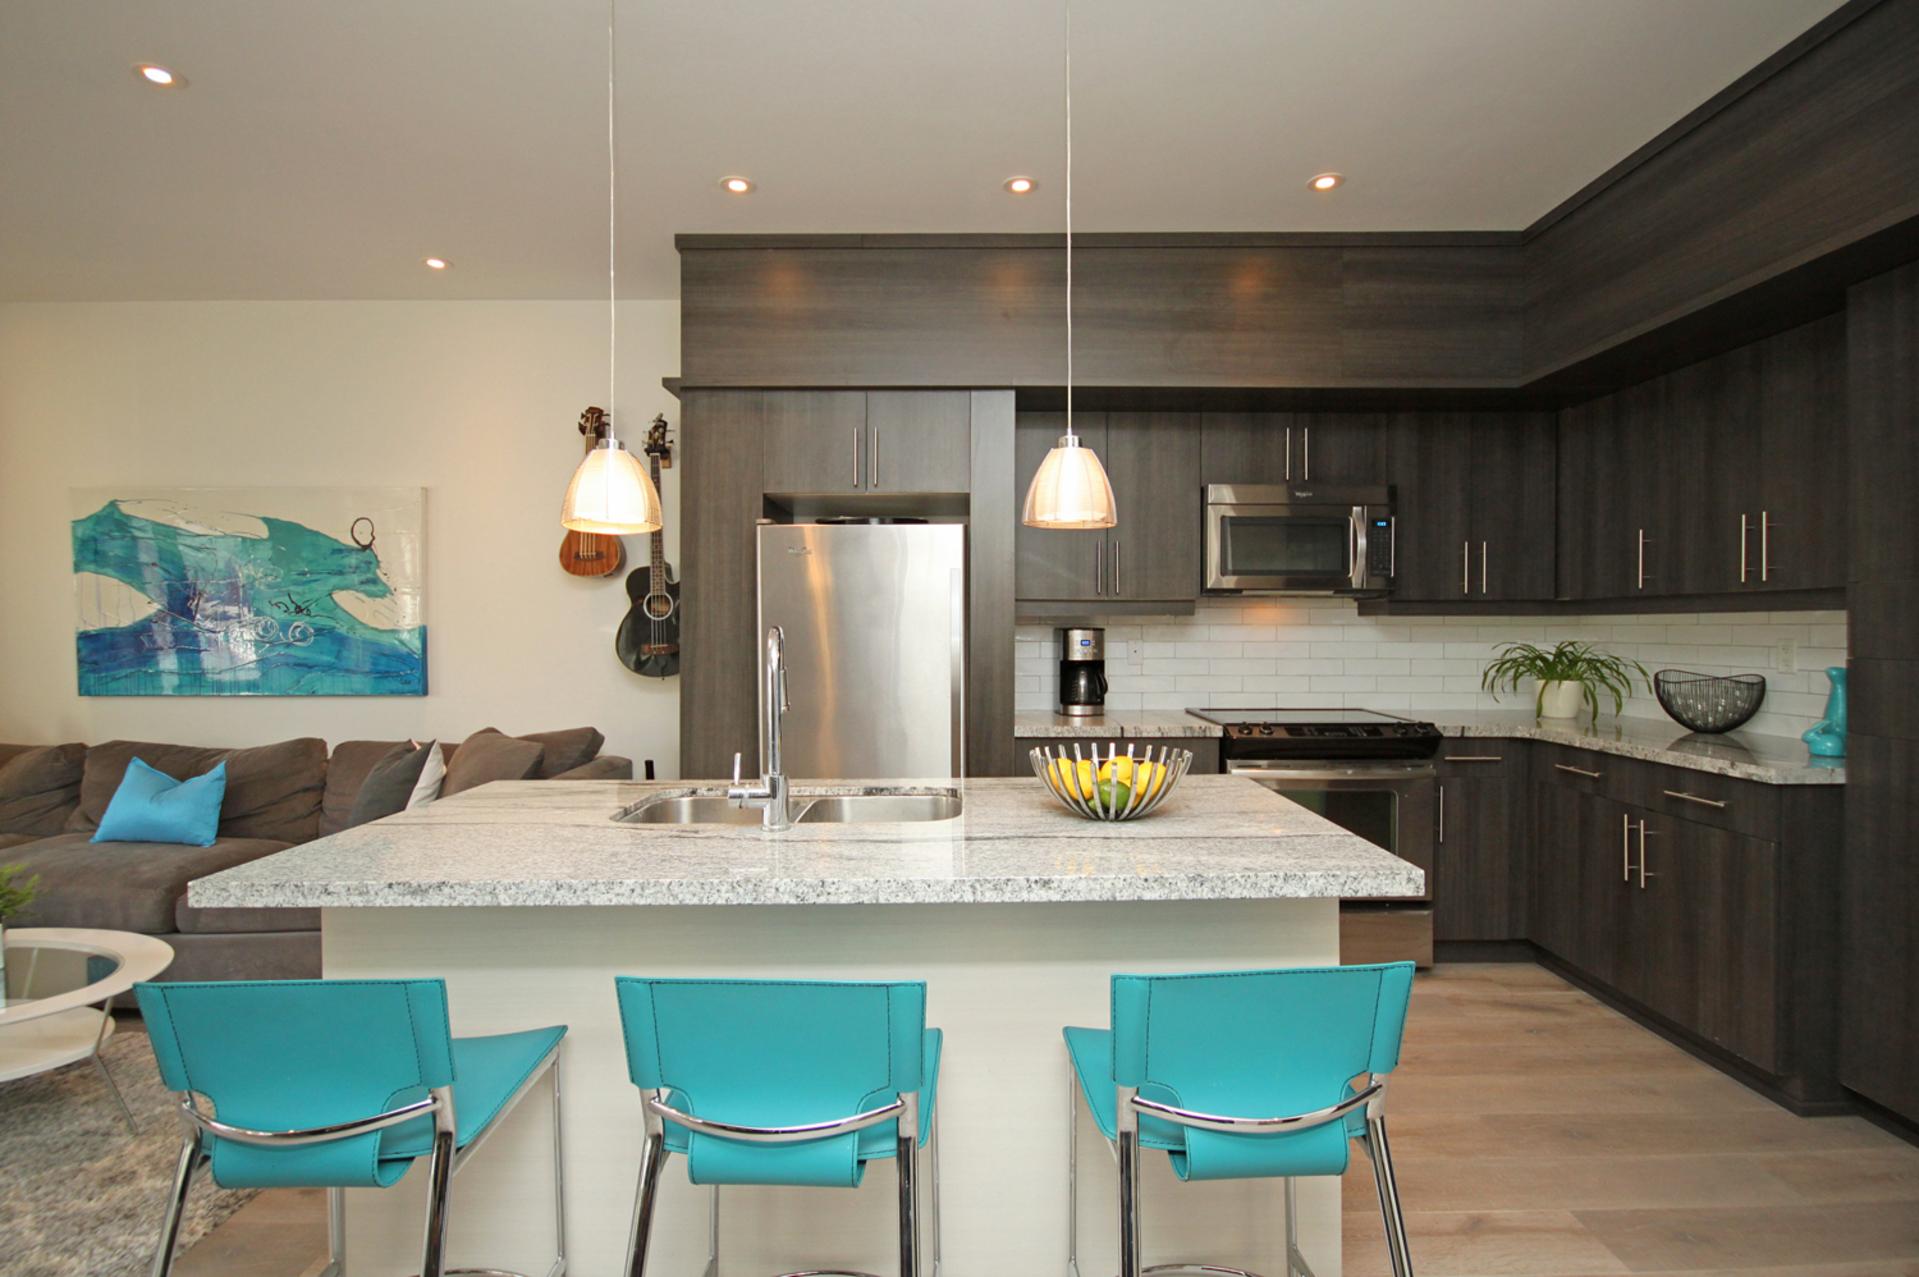 Kitchen at 114 - 2320 Gerrard Street E, East End-Danforth, Toronto